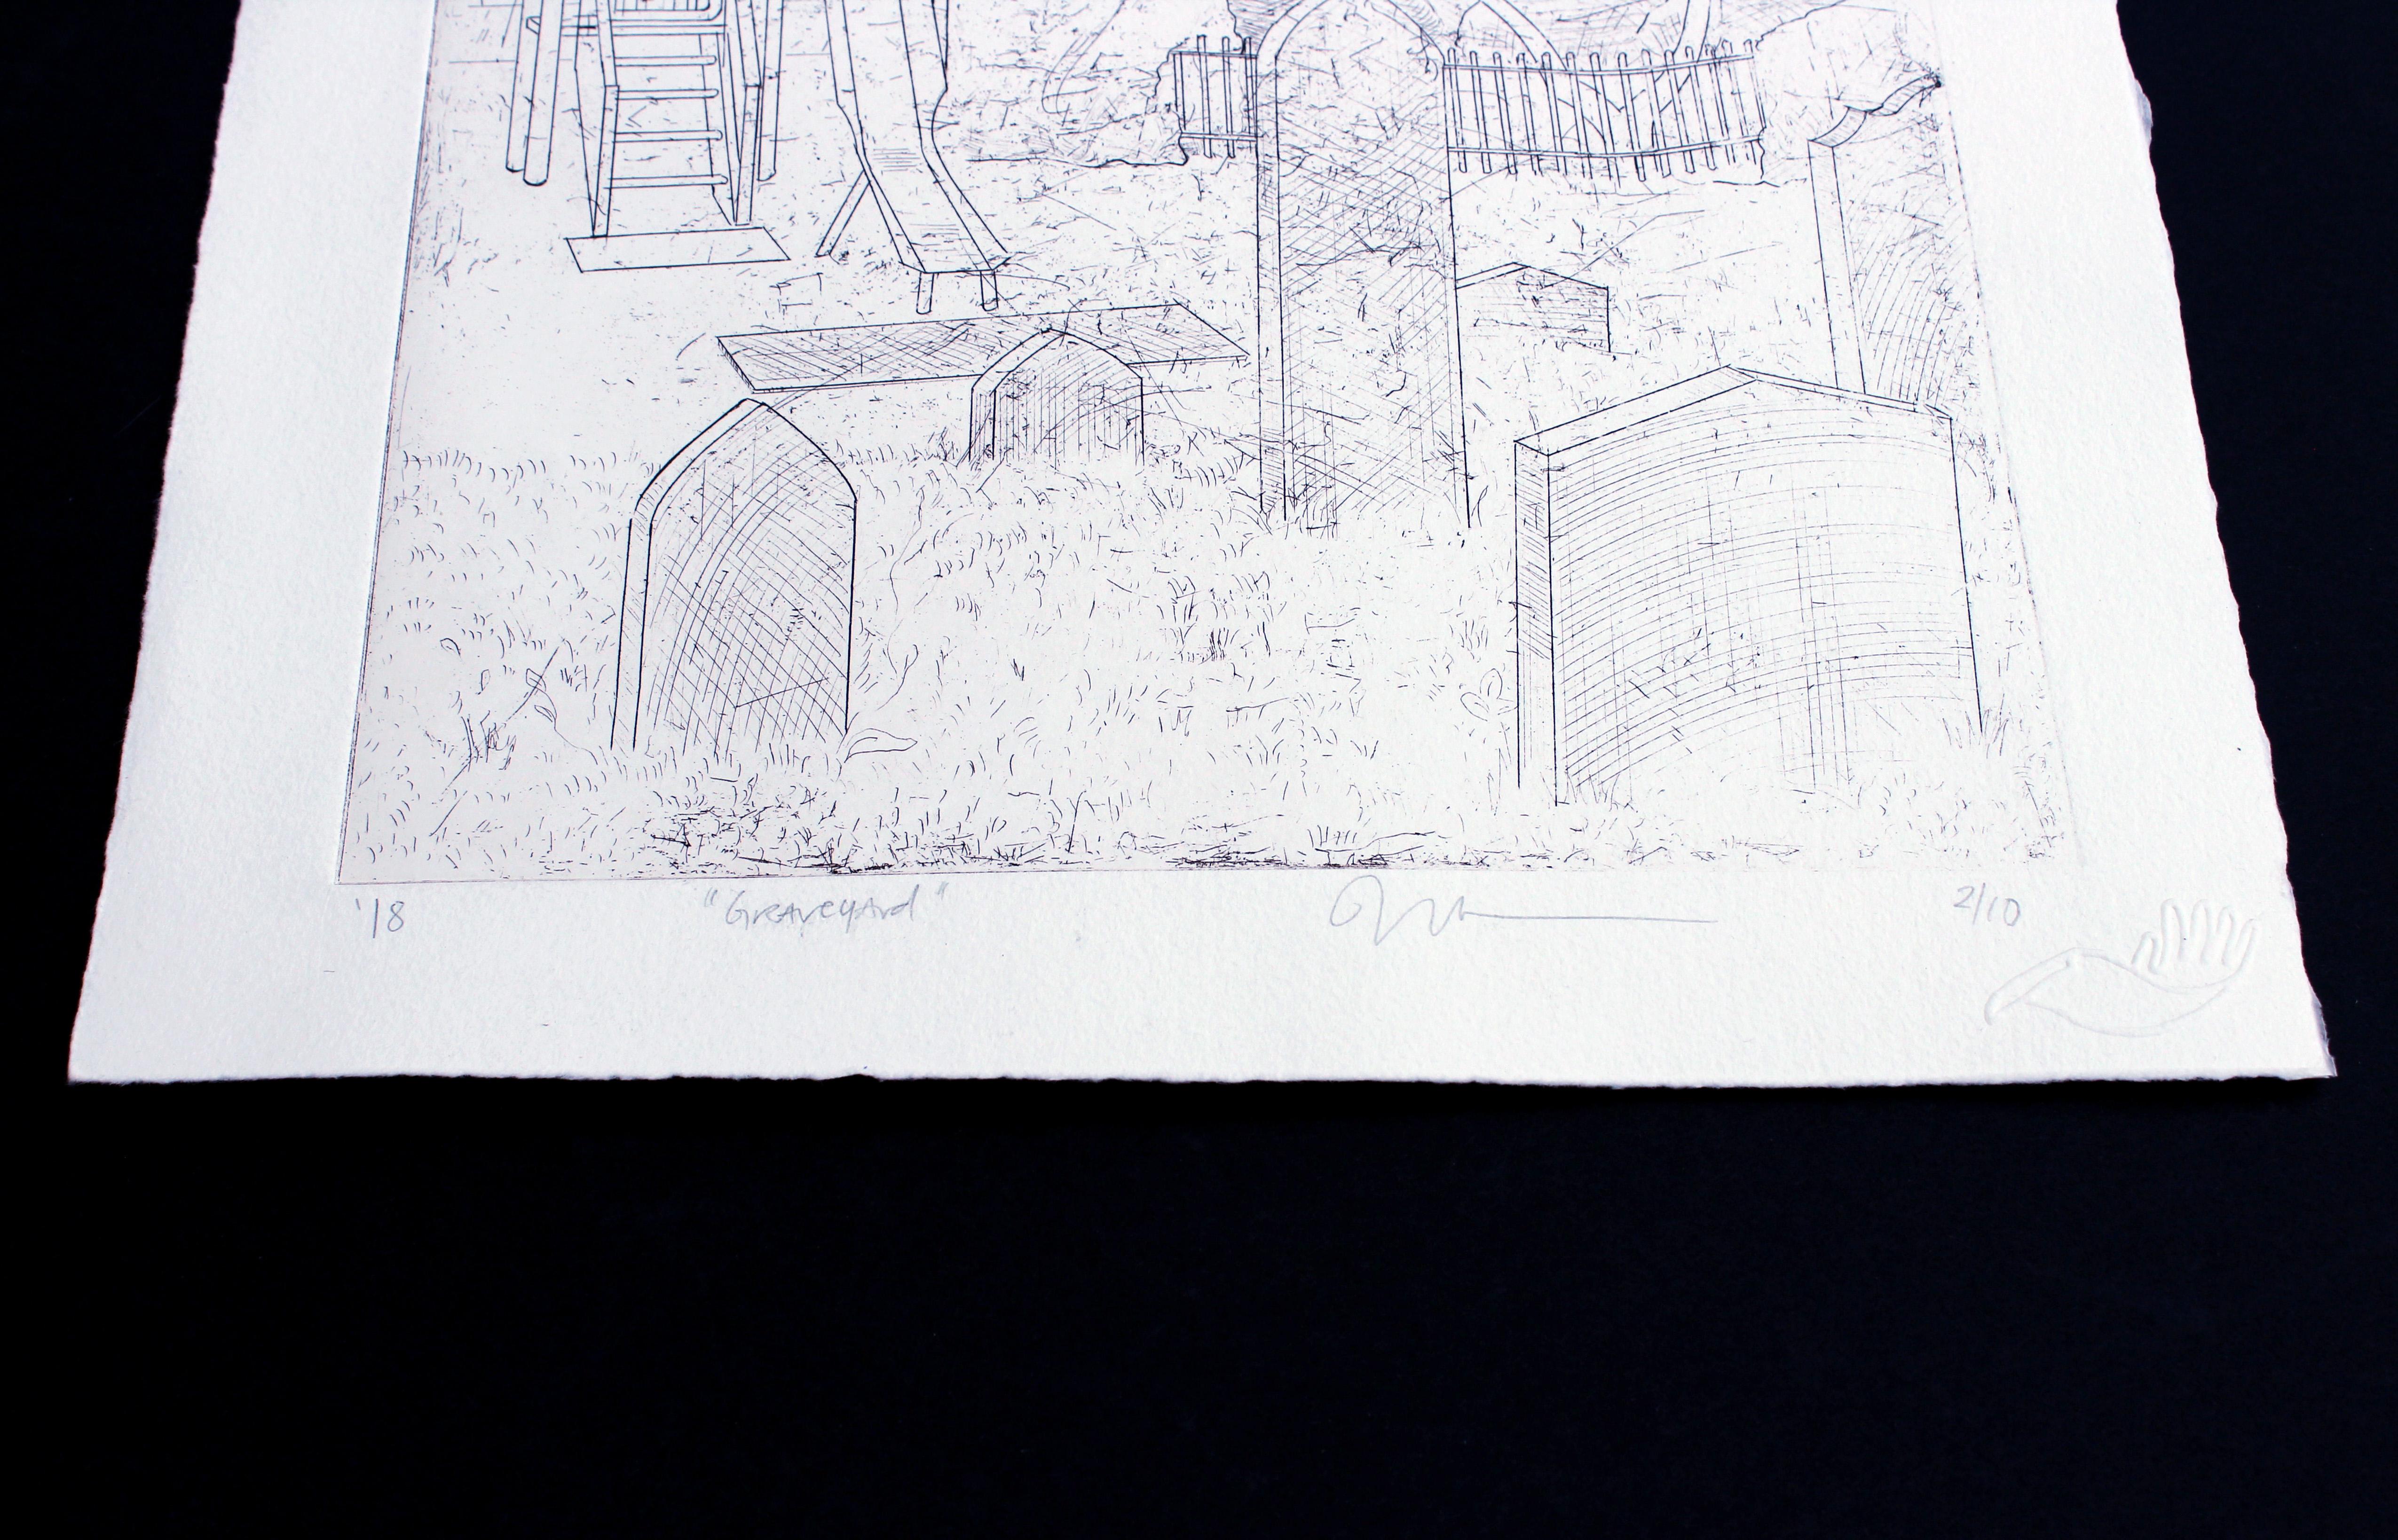 graveyard (detail 2)